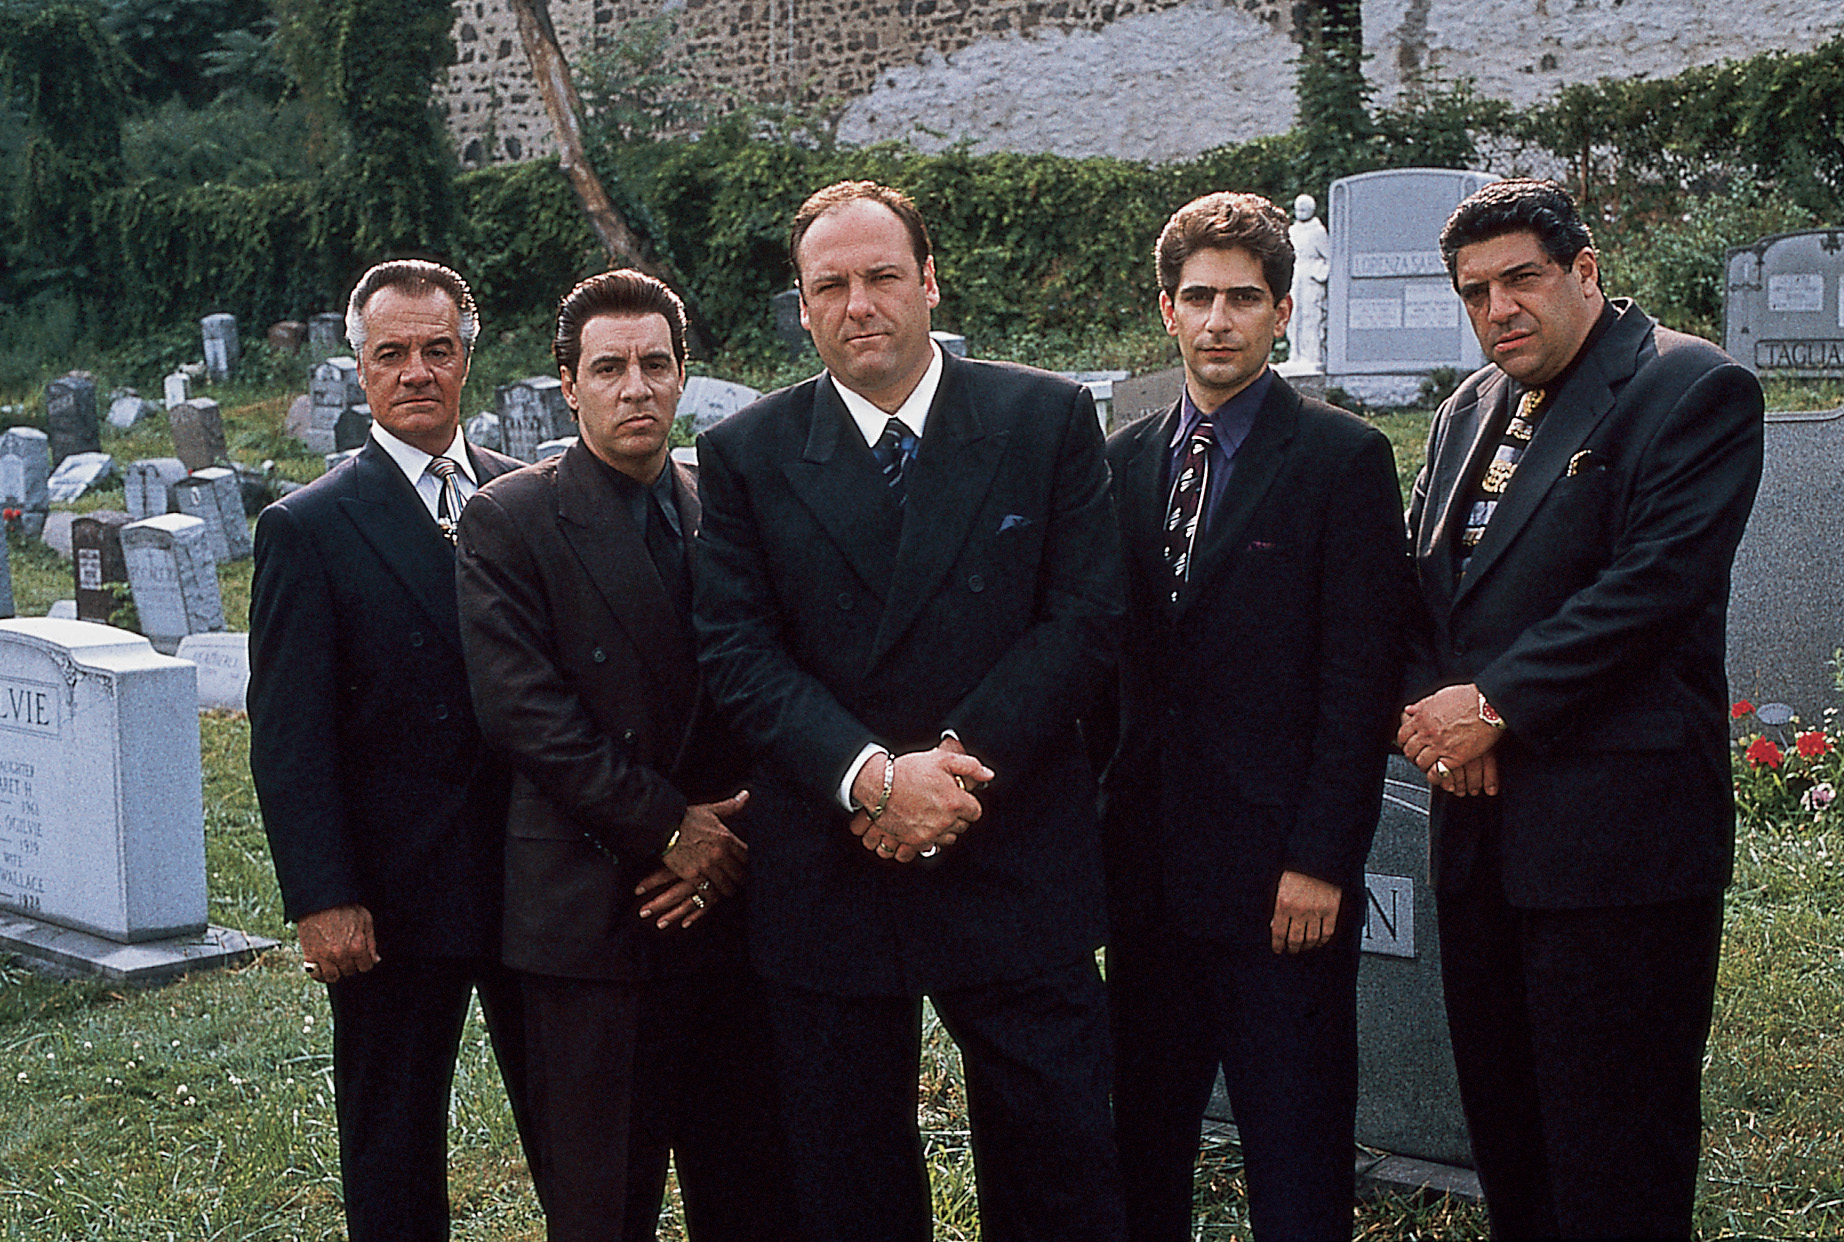 Vincent Pastore;James Gandolfini;Tony Sirico;Steve Van Zandt;Michael Imperioli